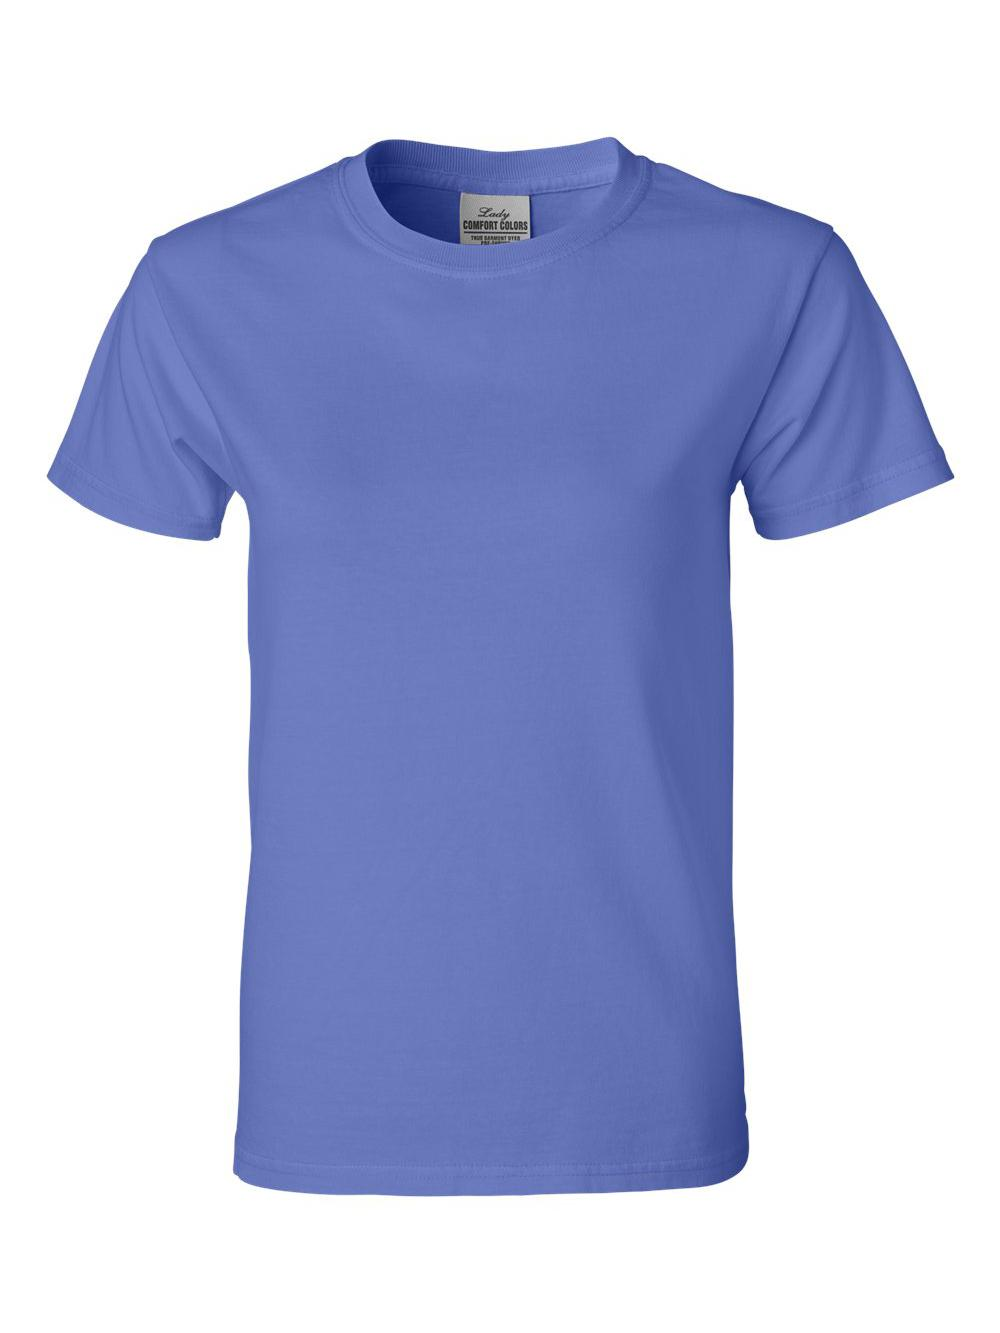 Comfort-Colors-Pigment-Dyed-Ringspun-Women-039-s-Short-Sleeve-T-Shirt-3333 thumbnail 17